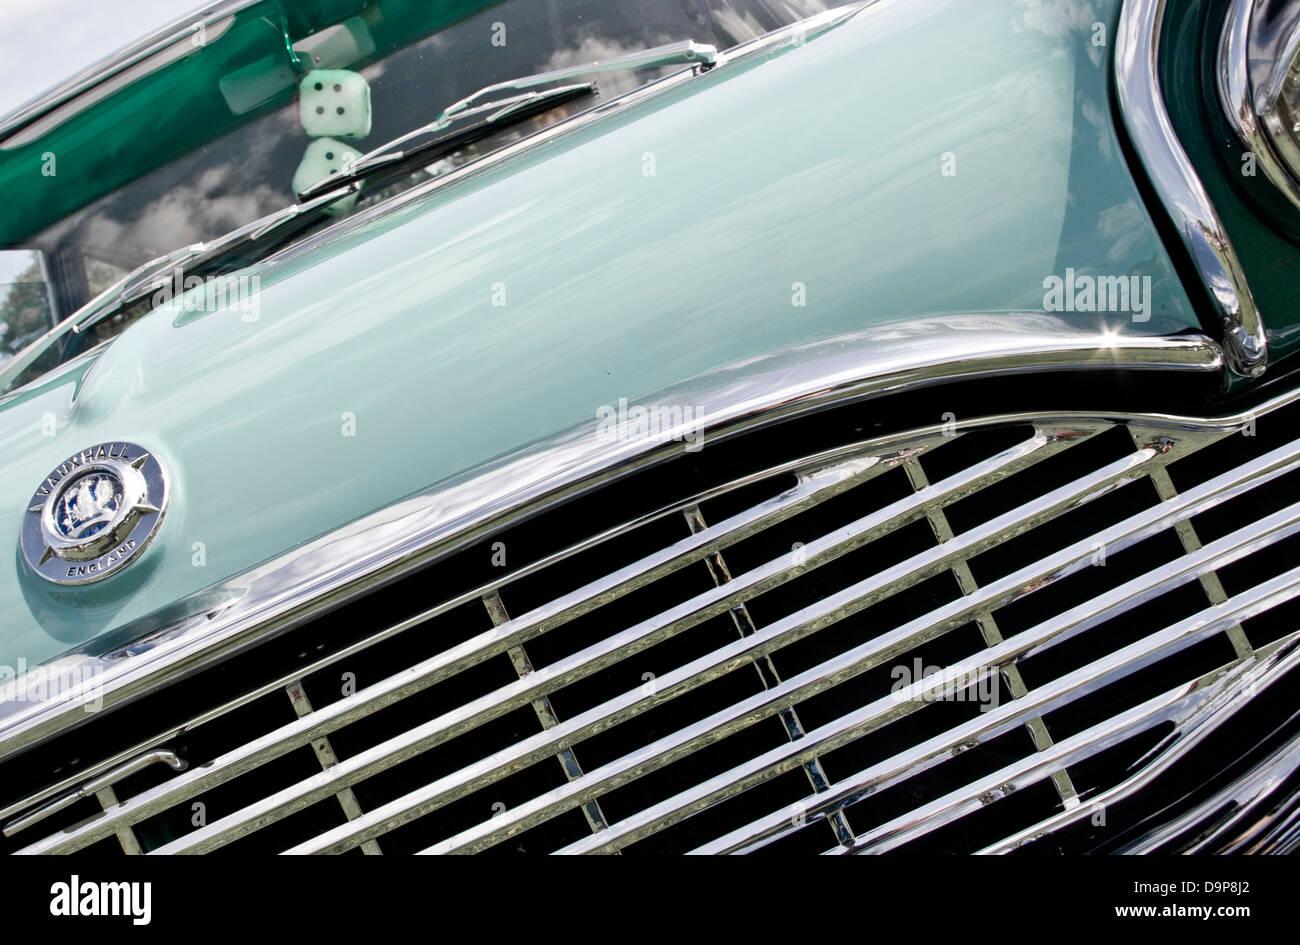 1950's Vauxhall Cresta bonnet hood grill radiator classic car - Stock Image